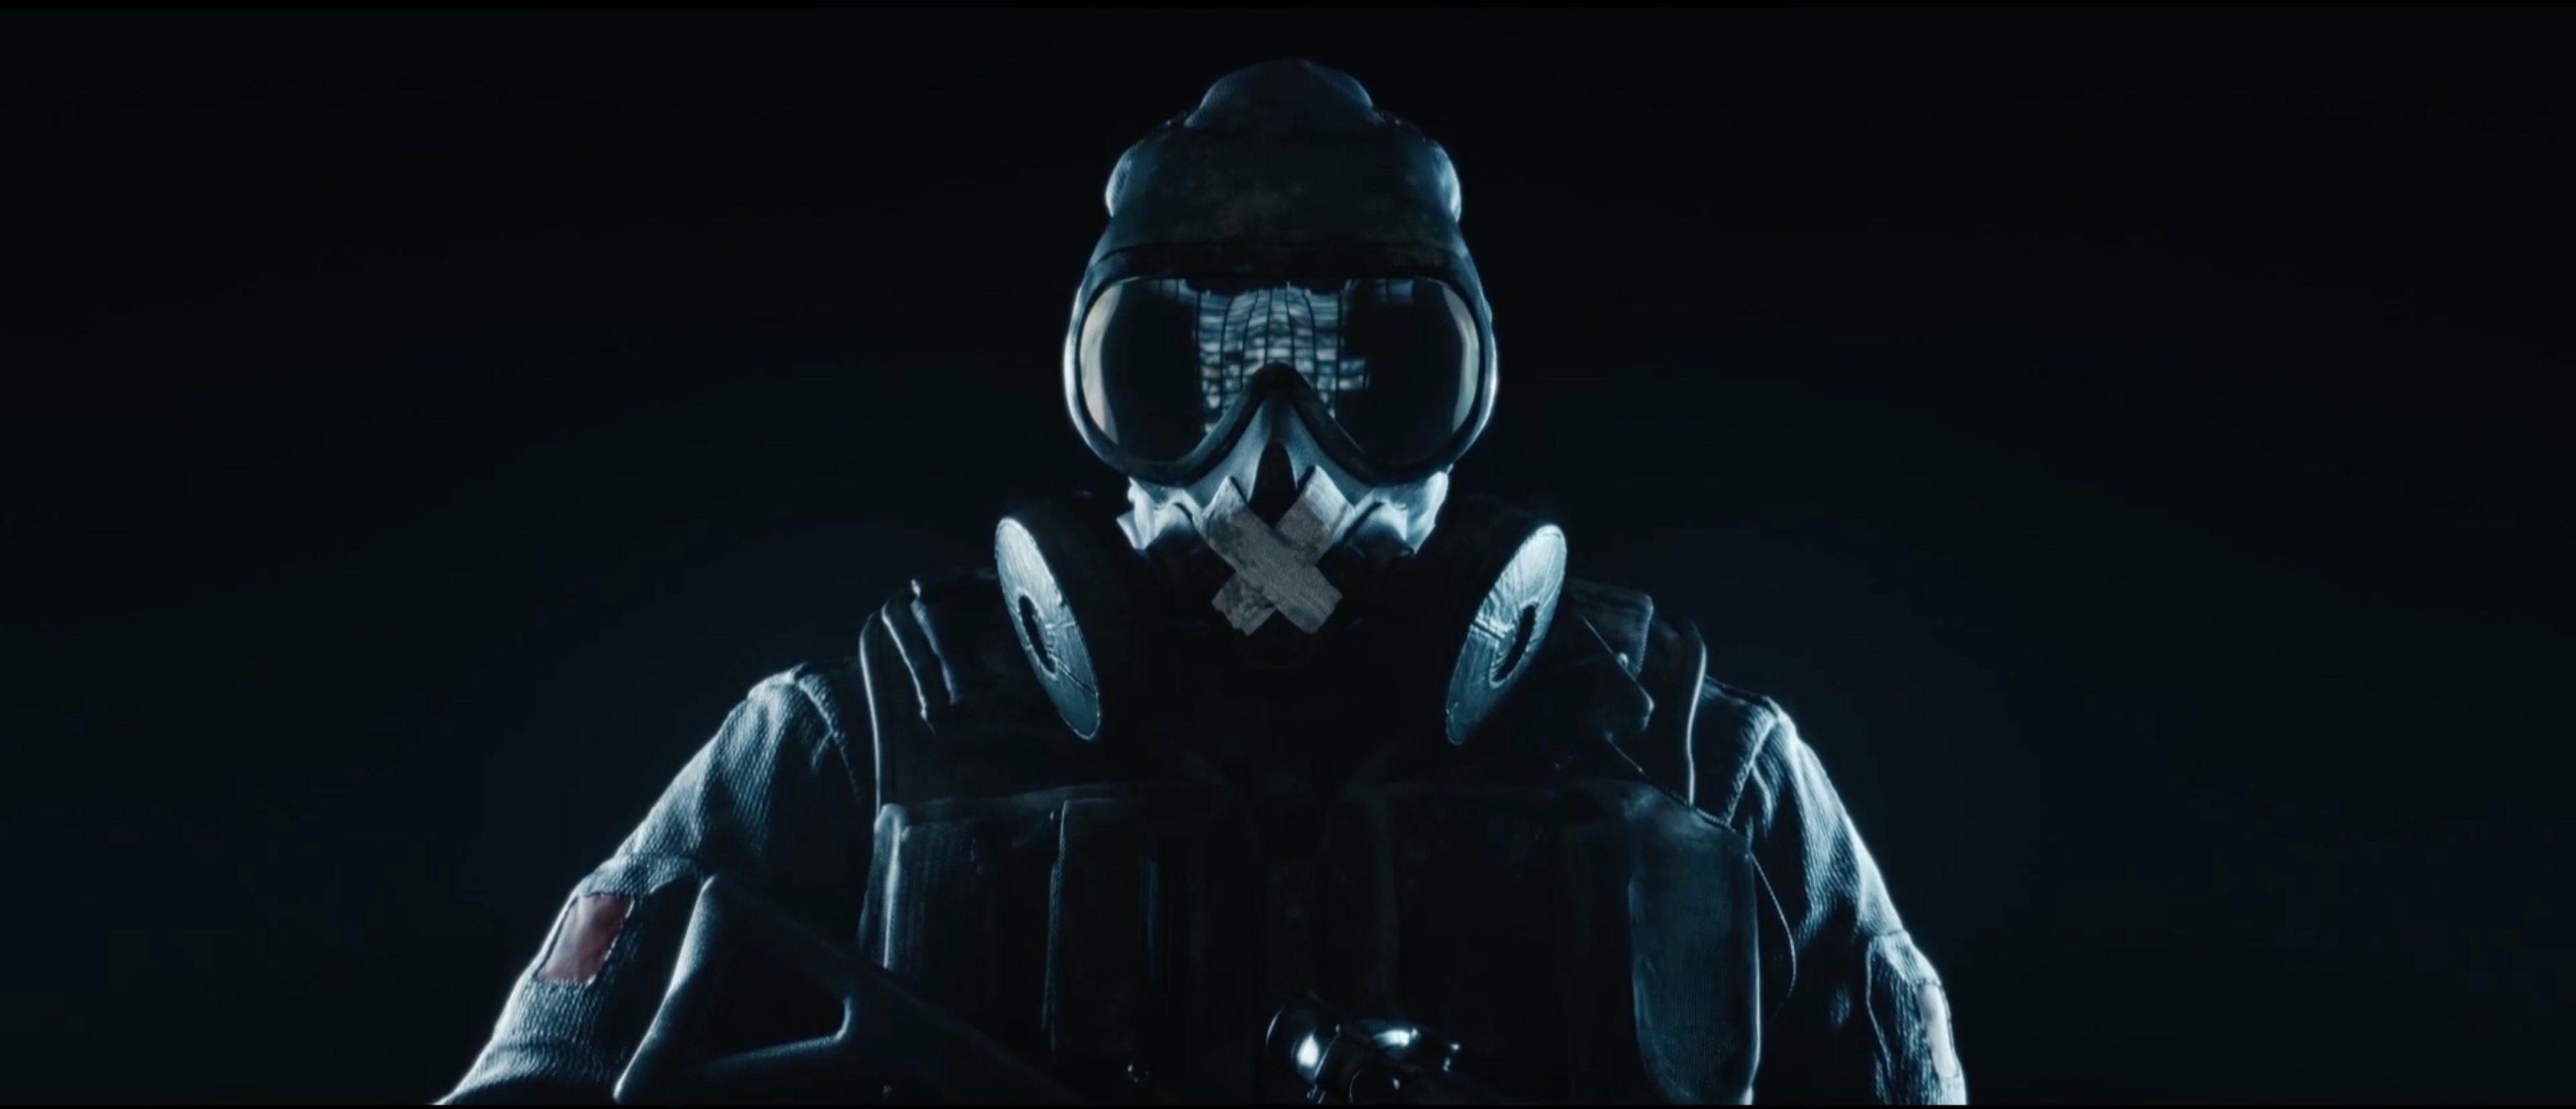 Tom Clancy's Rainbow Six Siege - Operator's Cinematic